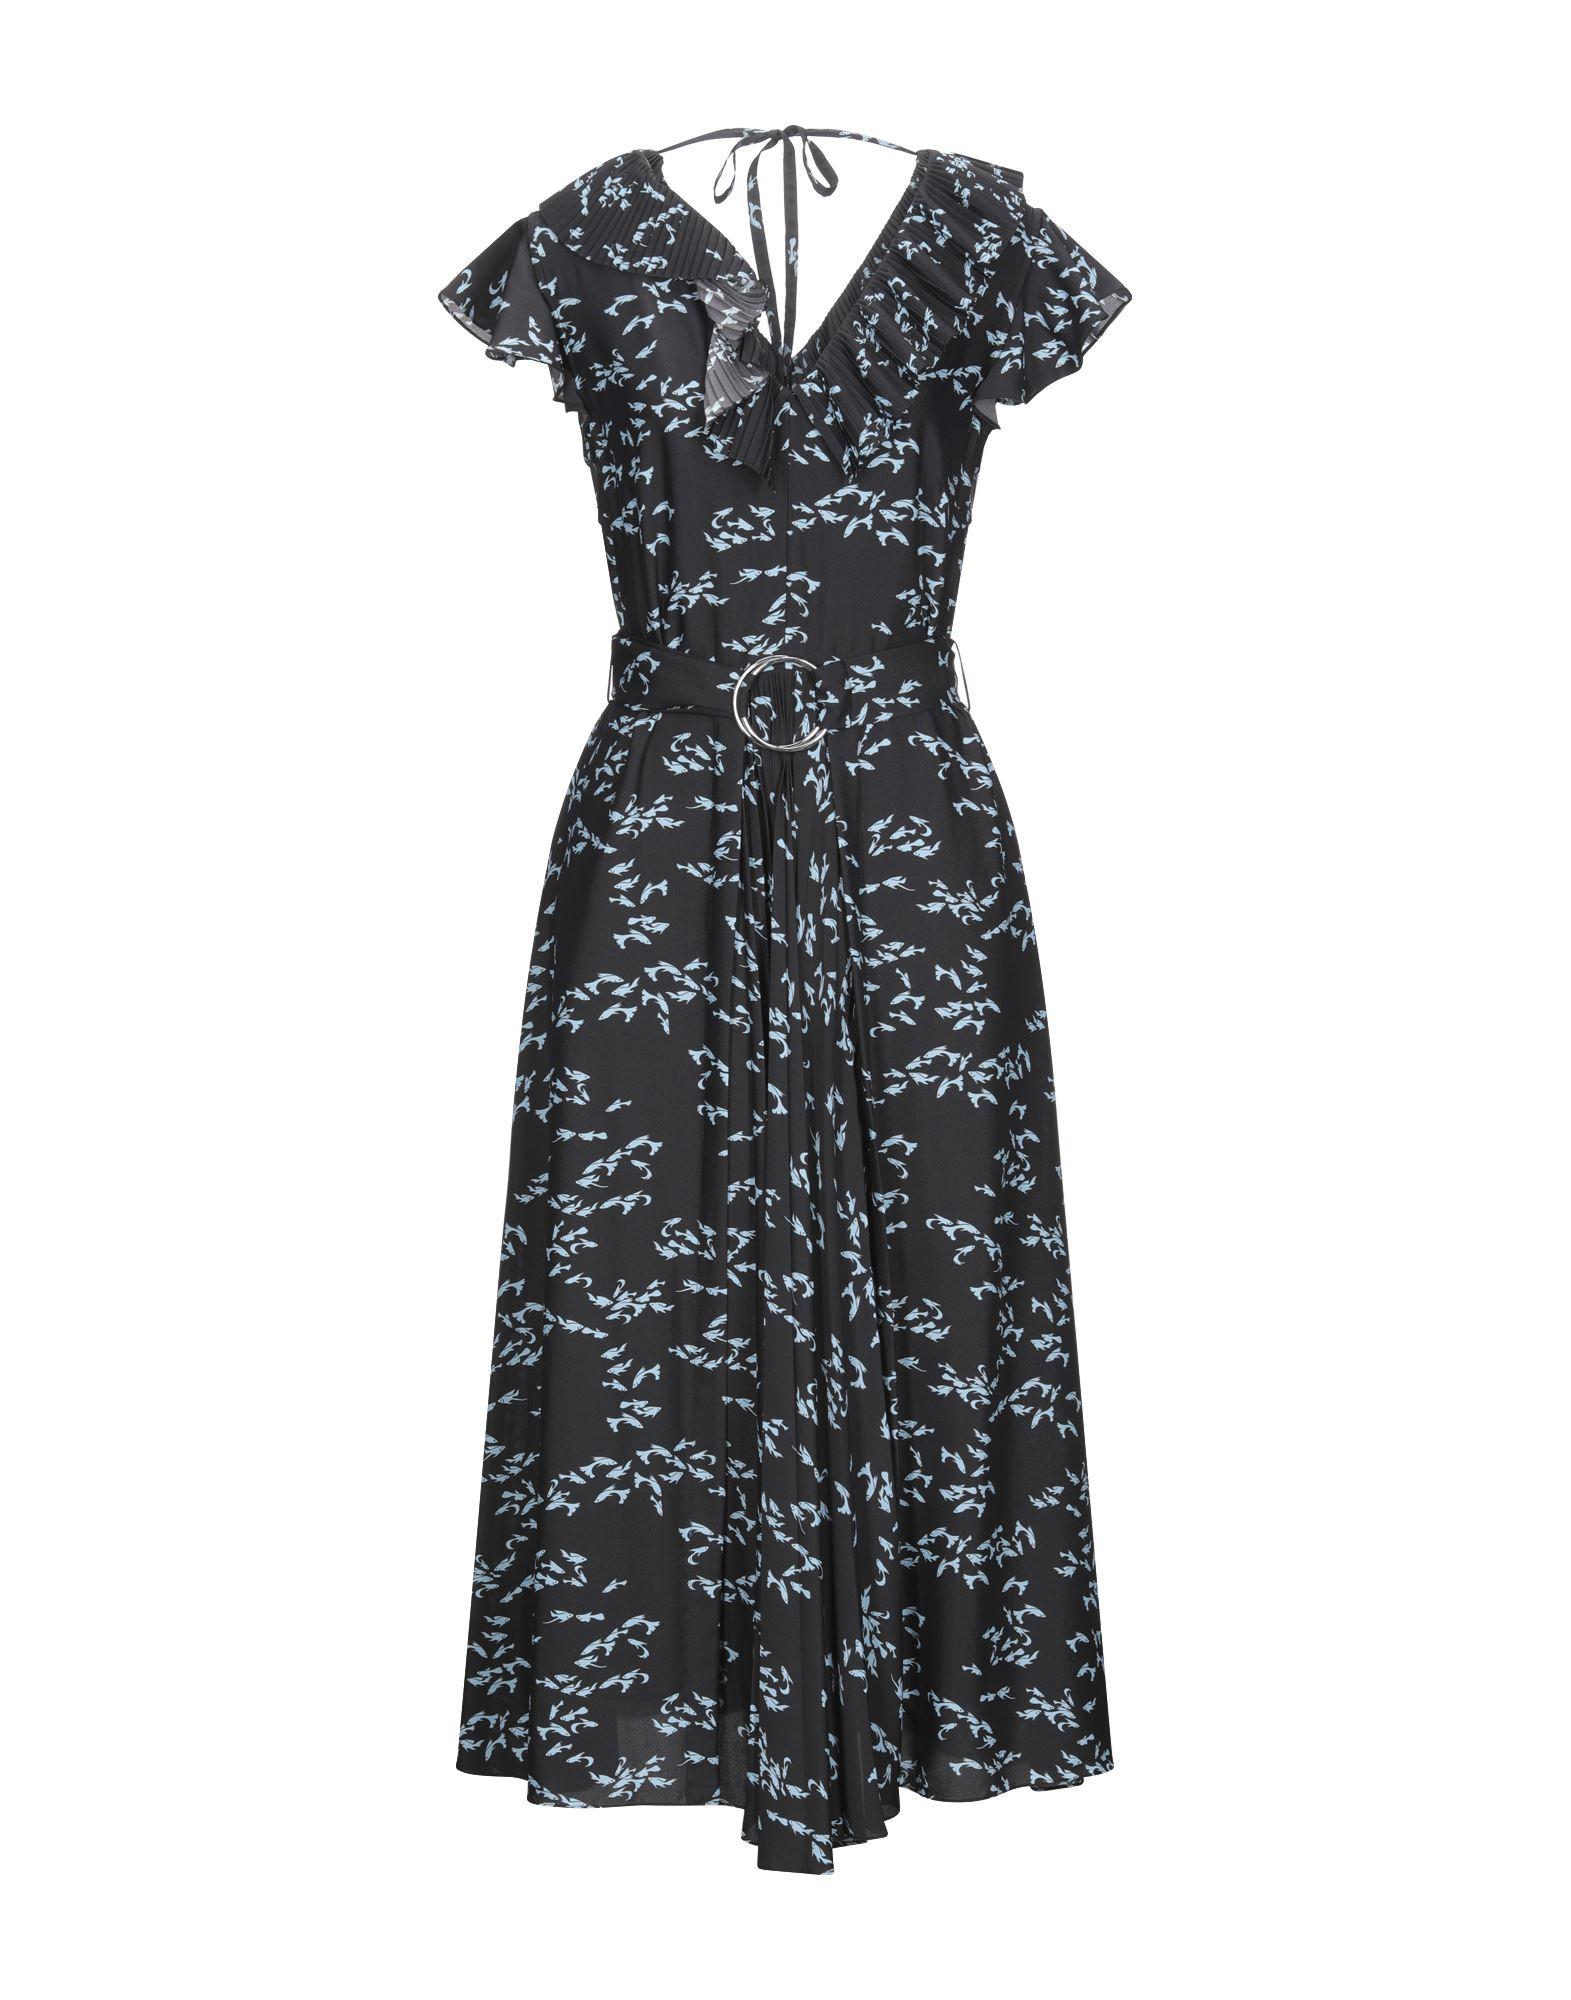 markus lupfer короткое платье MARKUS LUPFER Платье миди